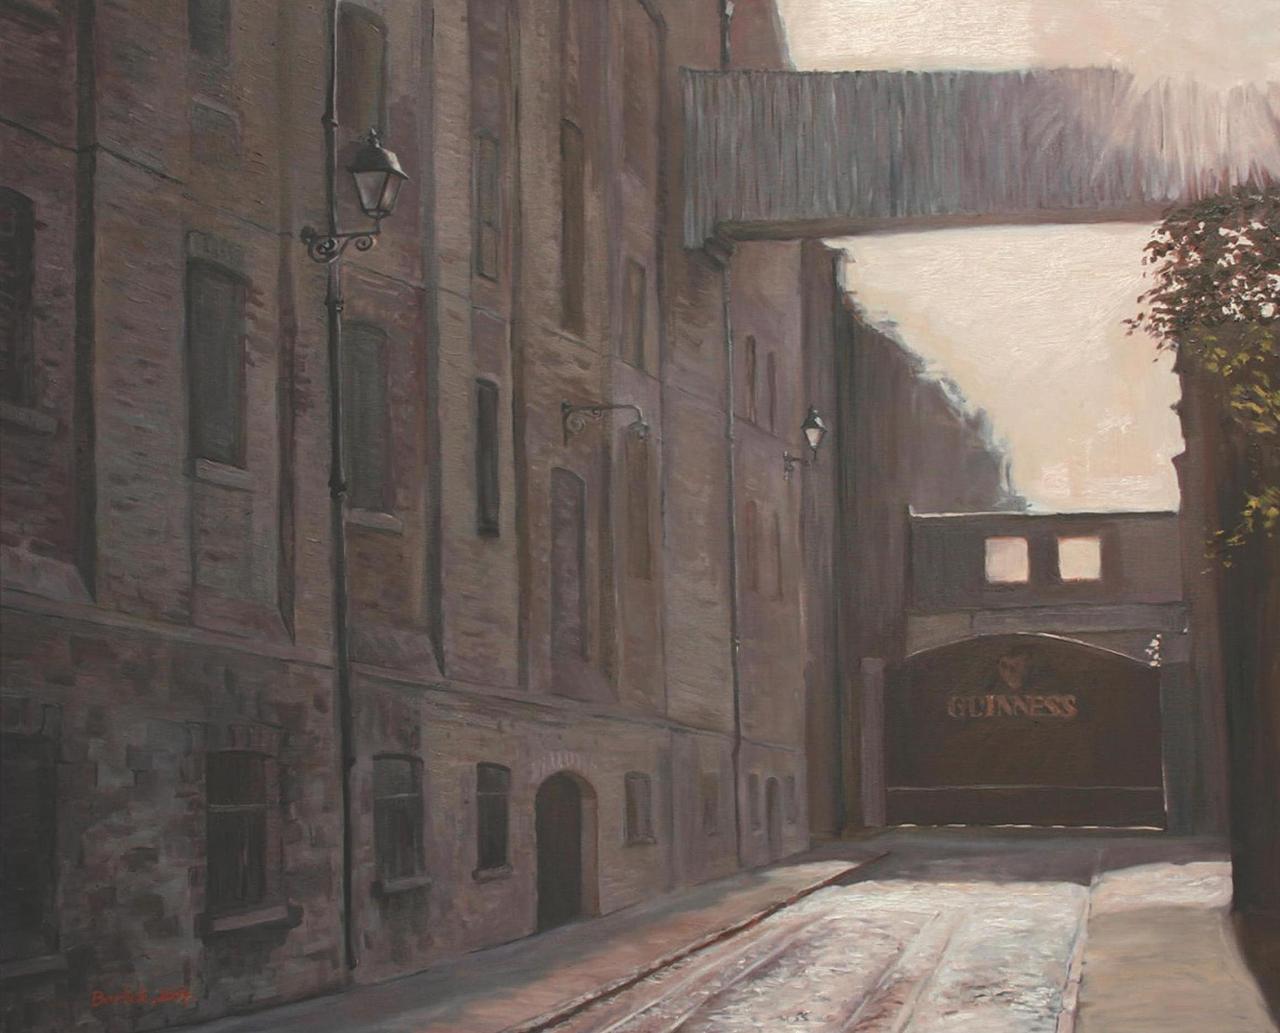 Giunness Gates (100x120)